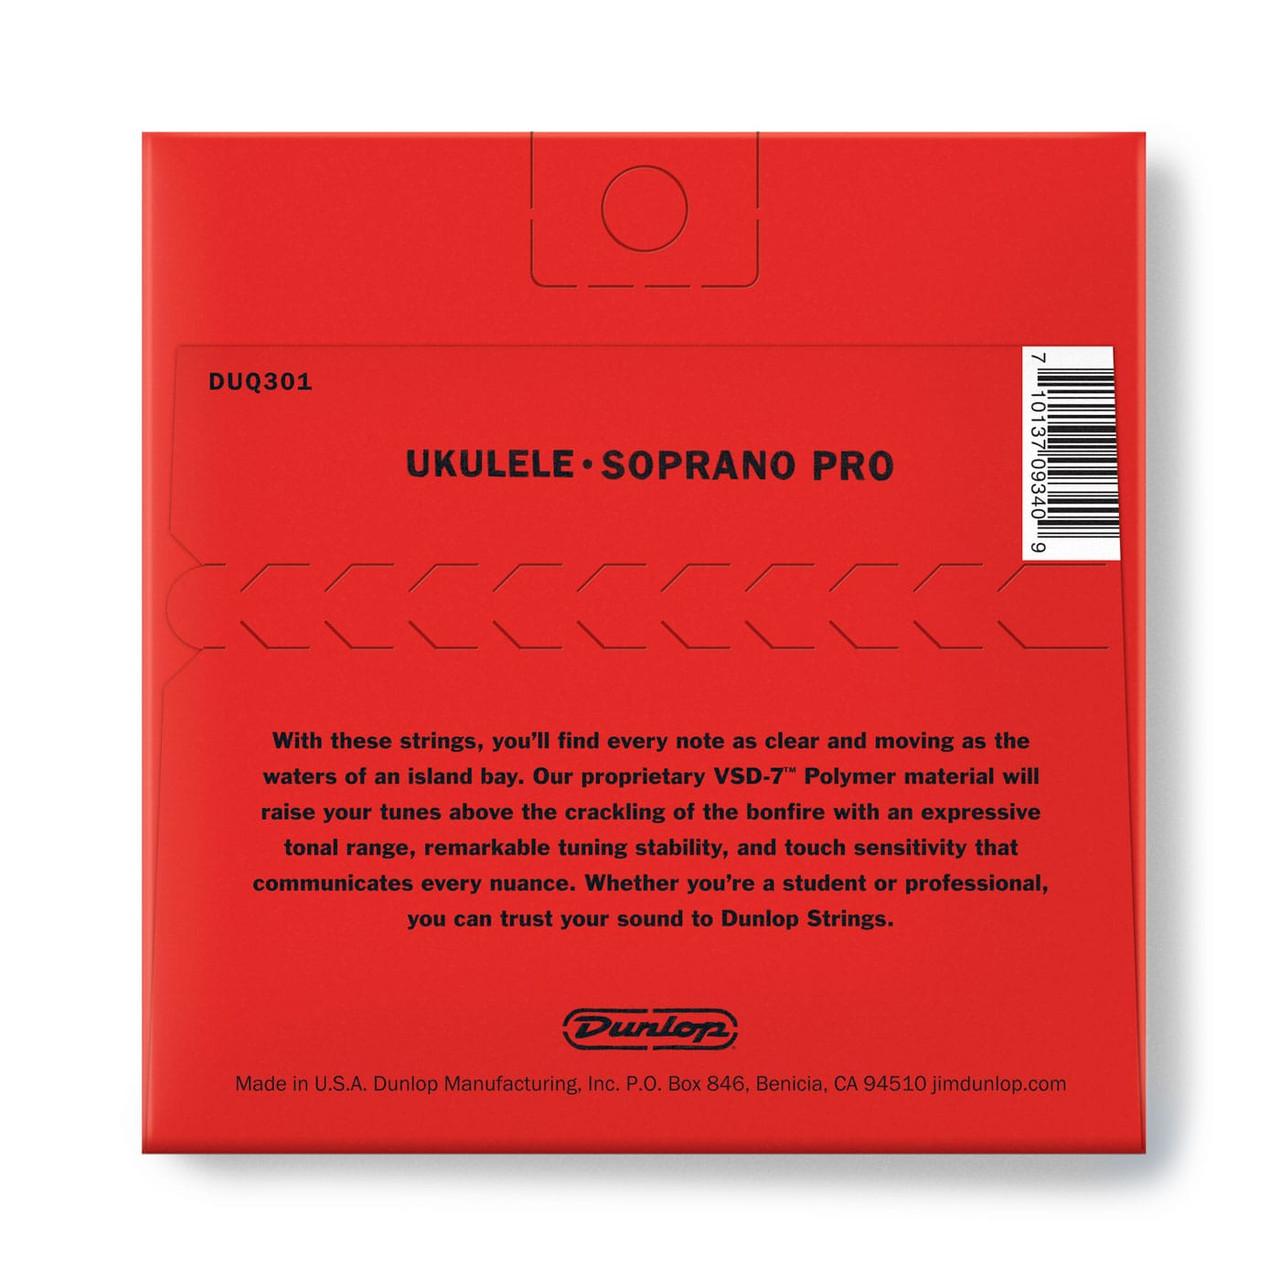 Dunlop DUY301 Soprano Pro Ukulele Strings 4 Strings//Set